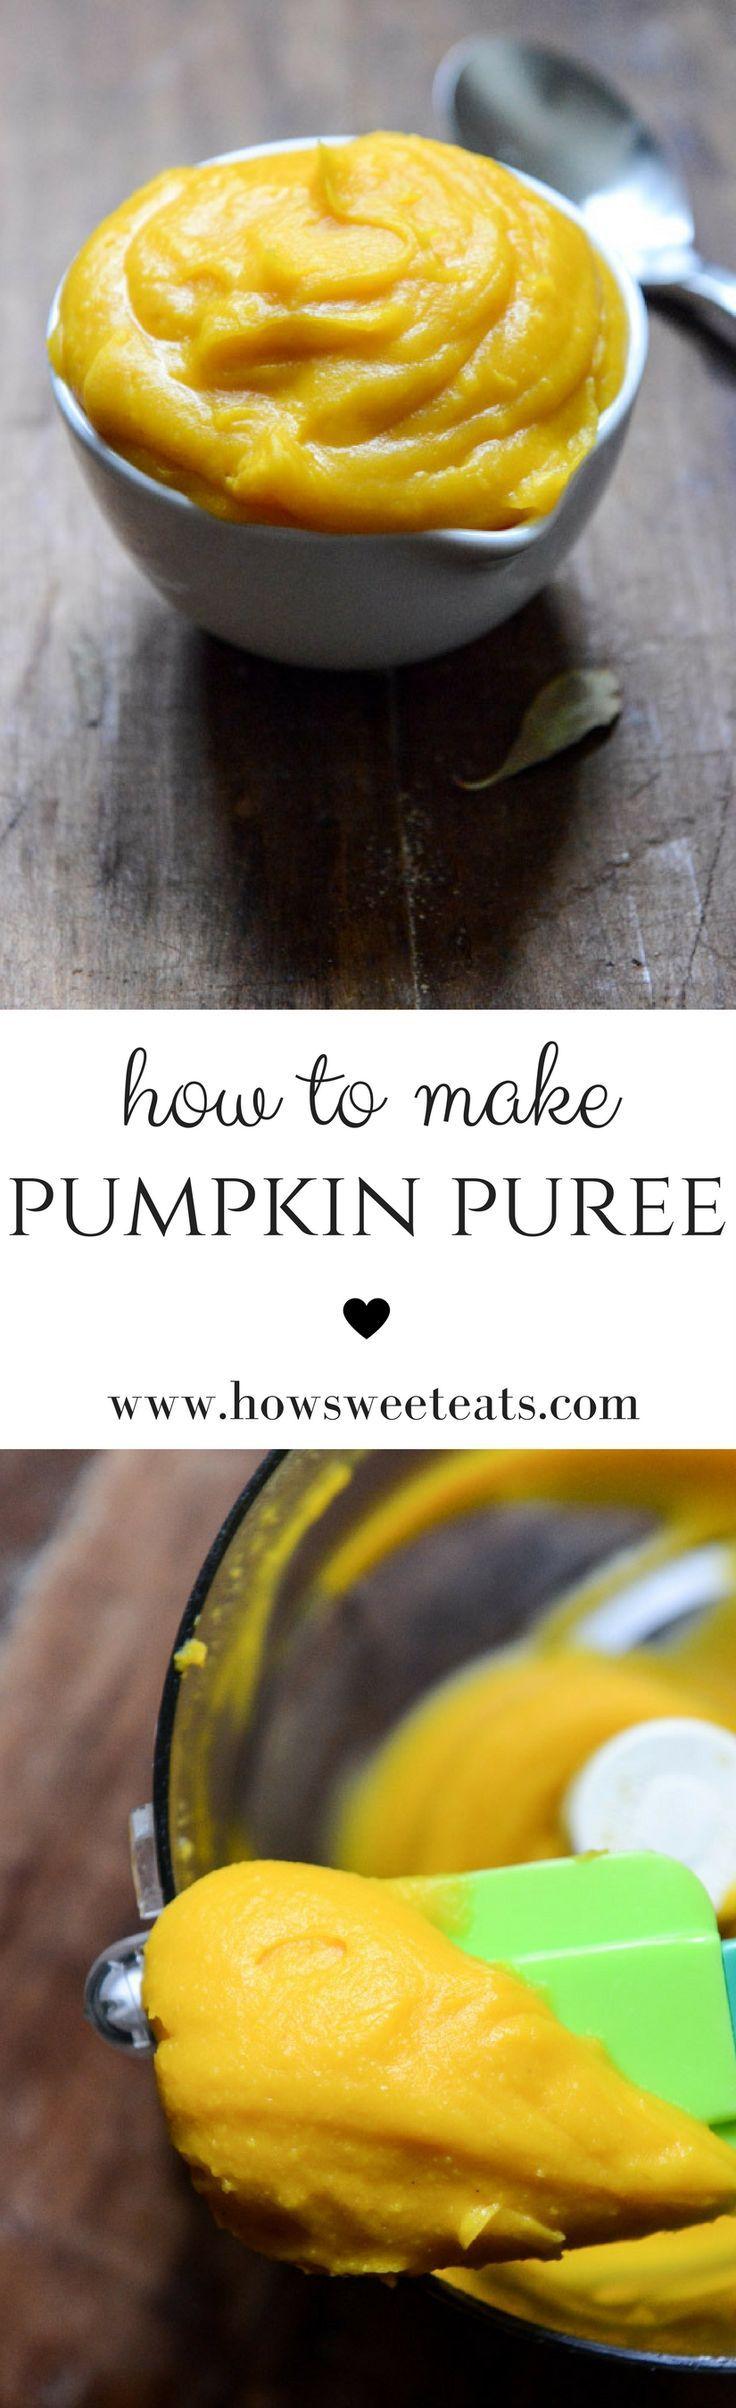 Exactly how I make Homemade Pumpkin Puree I http://howsweeteats.com /howsweeteats/ #thanksgiving